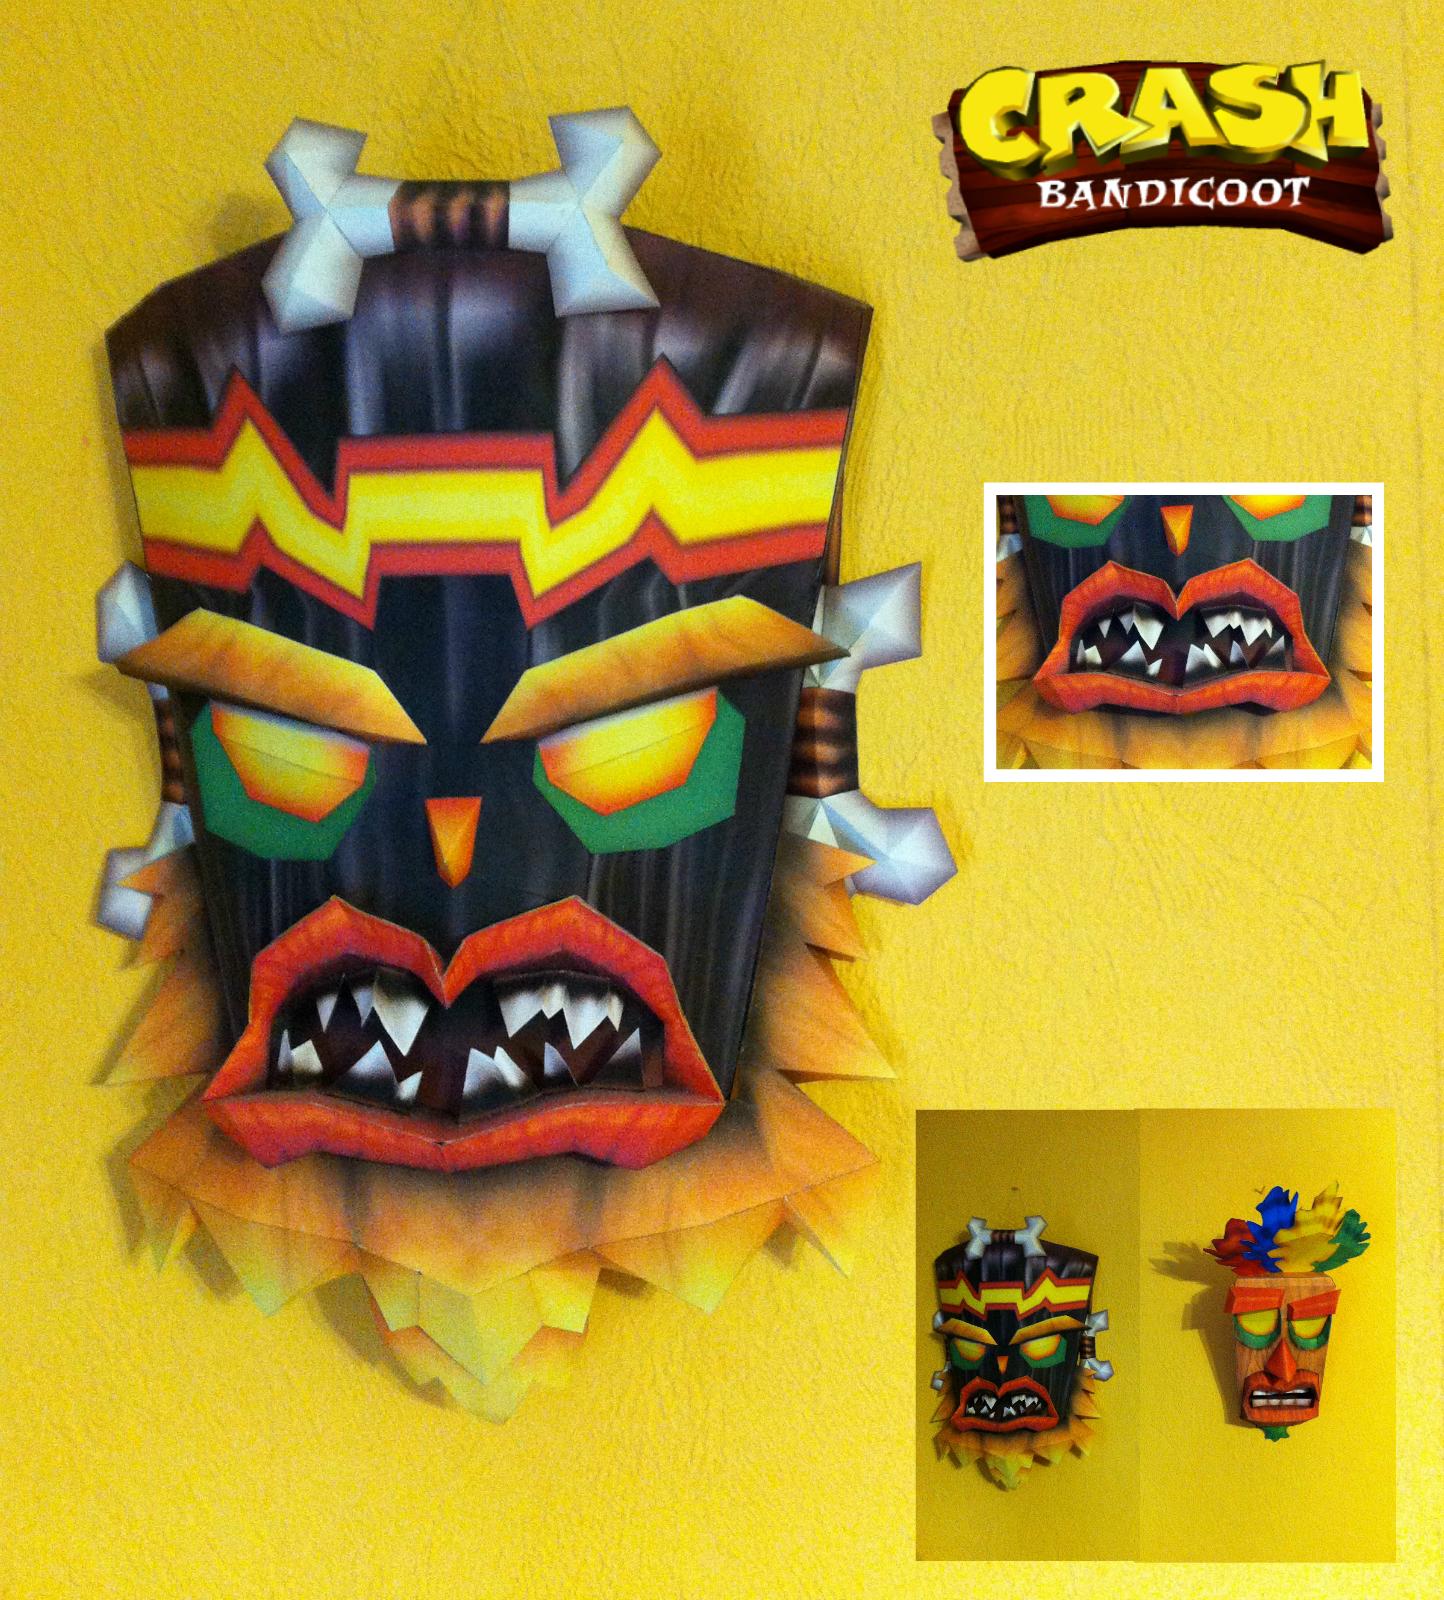 Twinsanity Crash Bandicoot Wallpaper